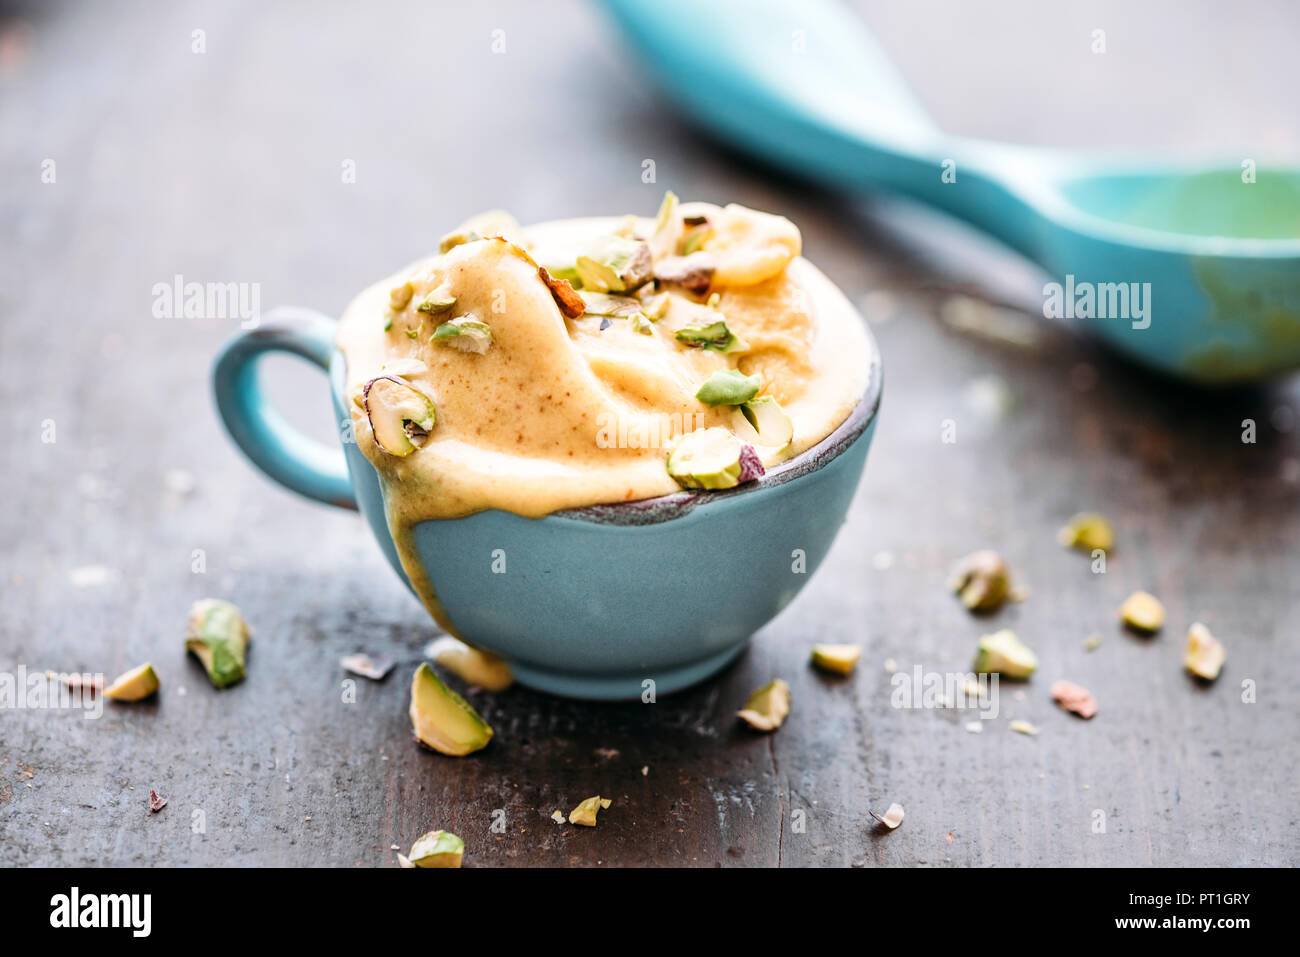 Homemade saffron ice cream with pistachio nuts, melting - Stock Image